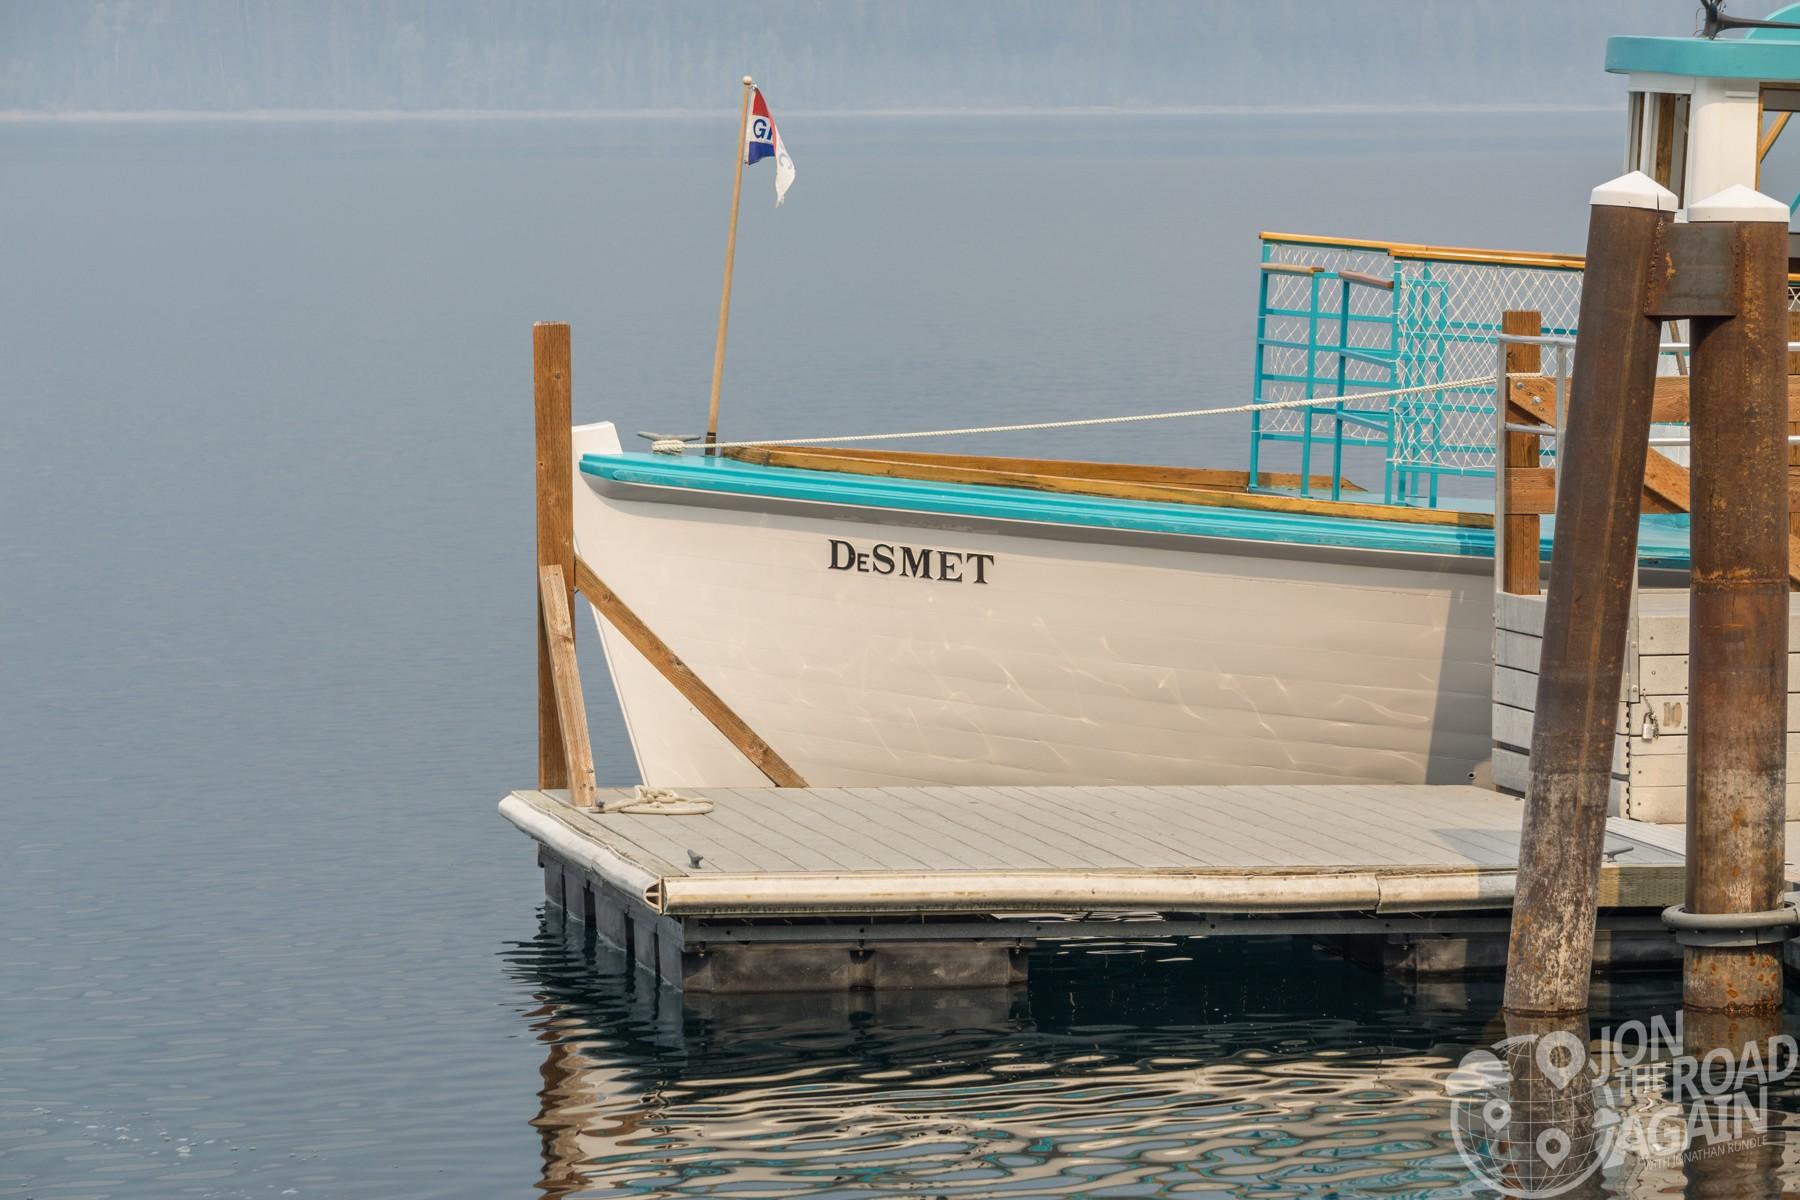 DeSmet lake mcdonald boat tour